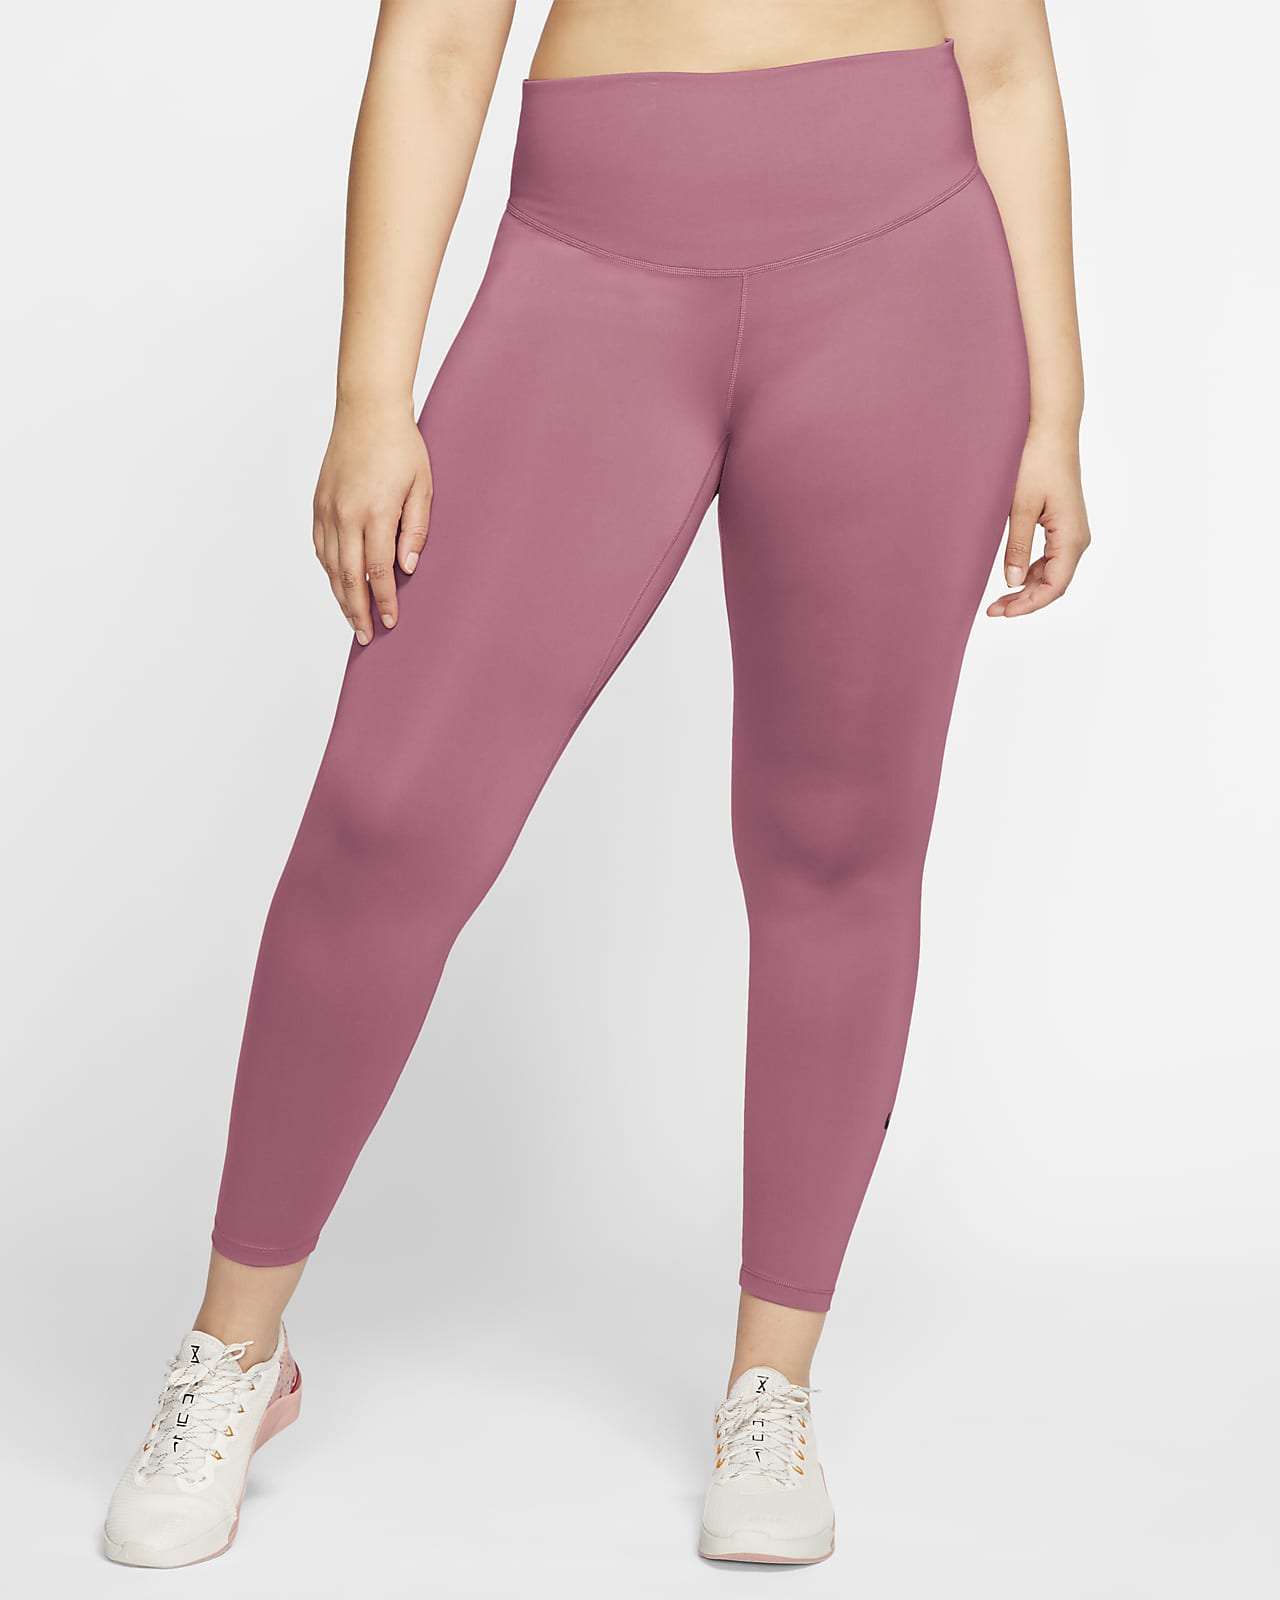 Nike One Women's Leggings (Plus size). Nike LU